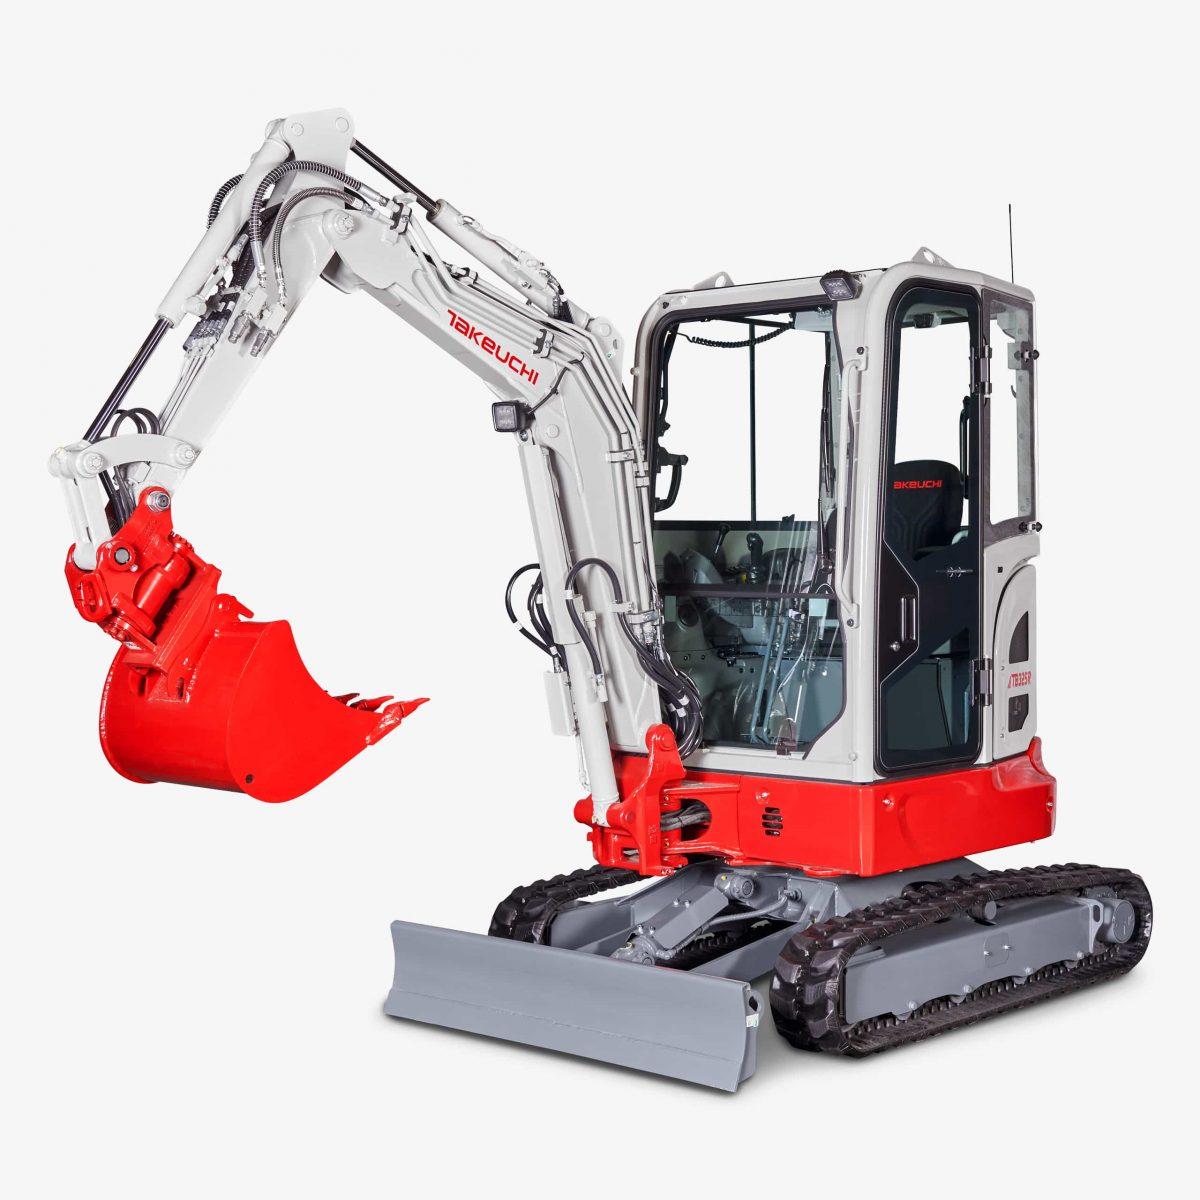 Huppenkothen Baumaschinen Bagger Minibagger Takeuchi TB325R Kurzheckbagger mit Kabine